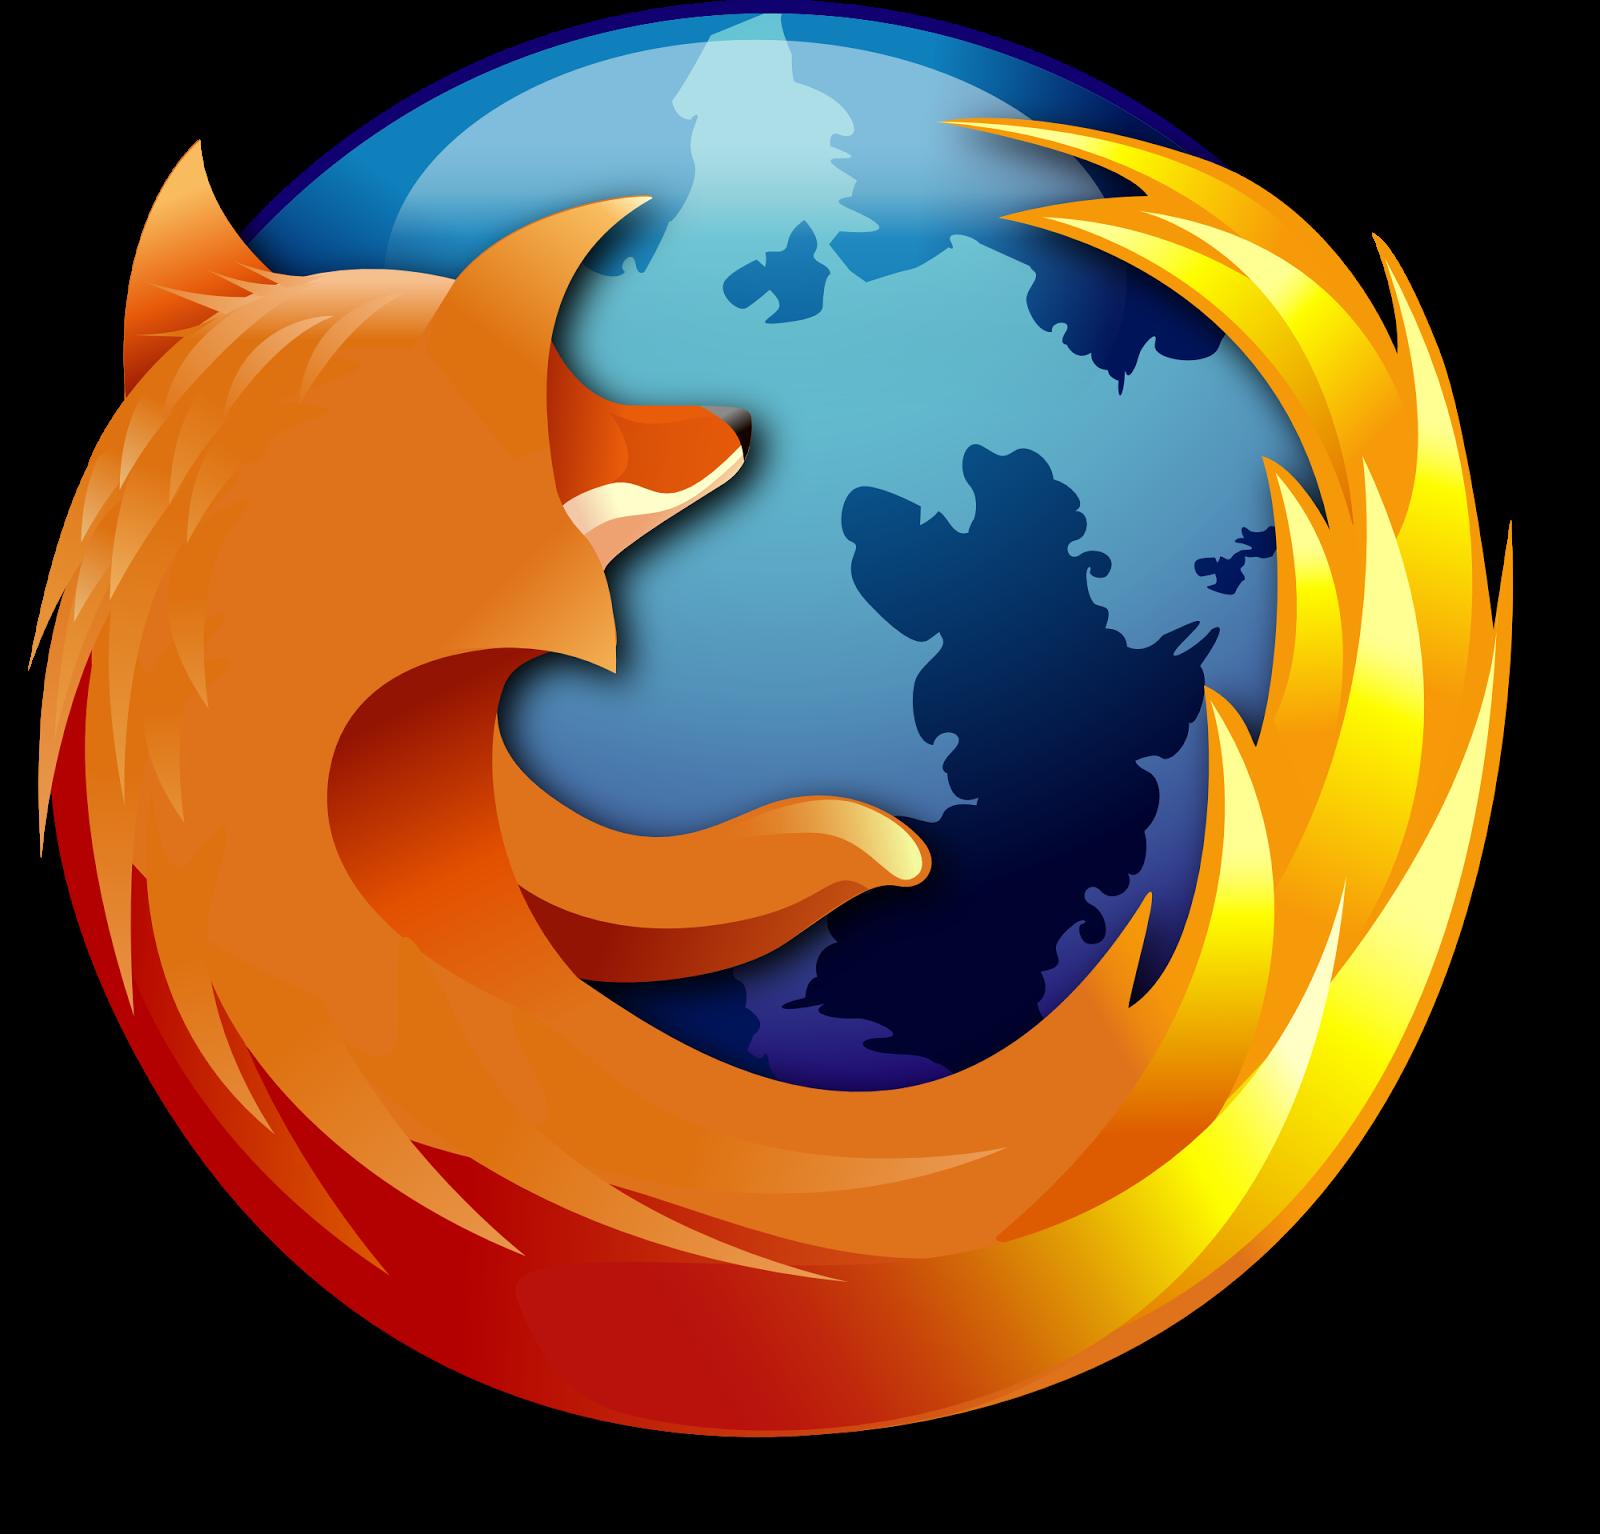 تحميل متصفح فاير فوكس Firefox Setup 30.0 عربي فاير فوكسDownload Firefox 2015